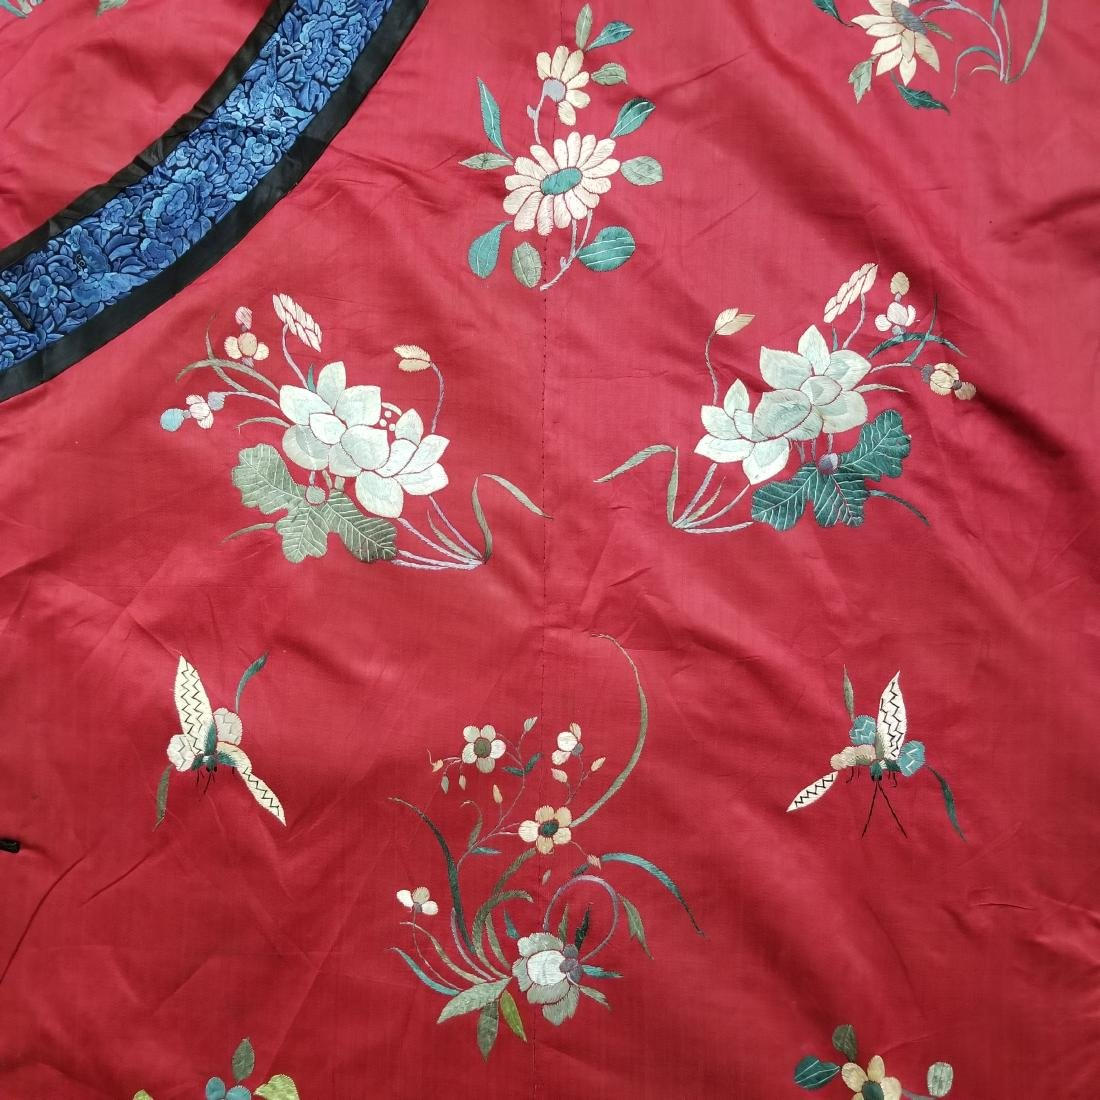 Antique Chinese Silk Hand Embroidered Silk Robe - 7